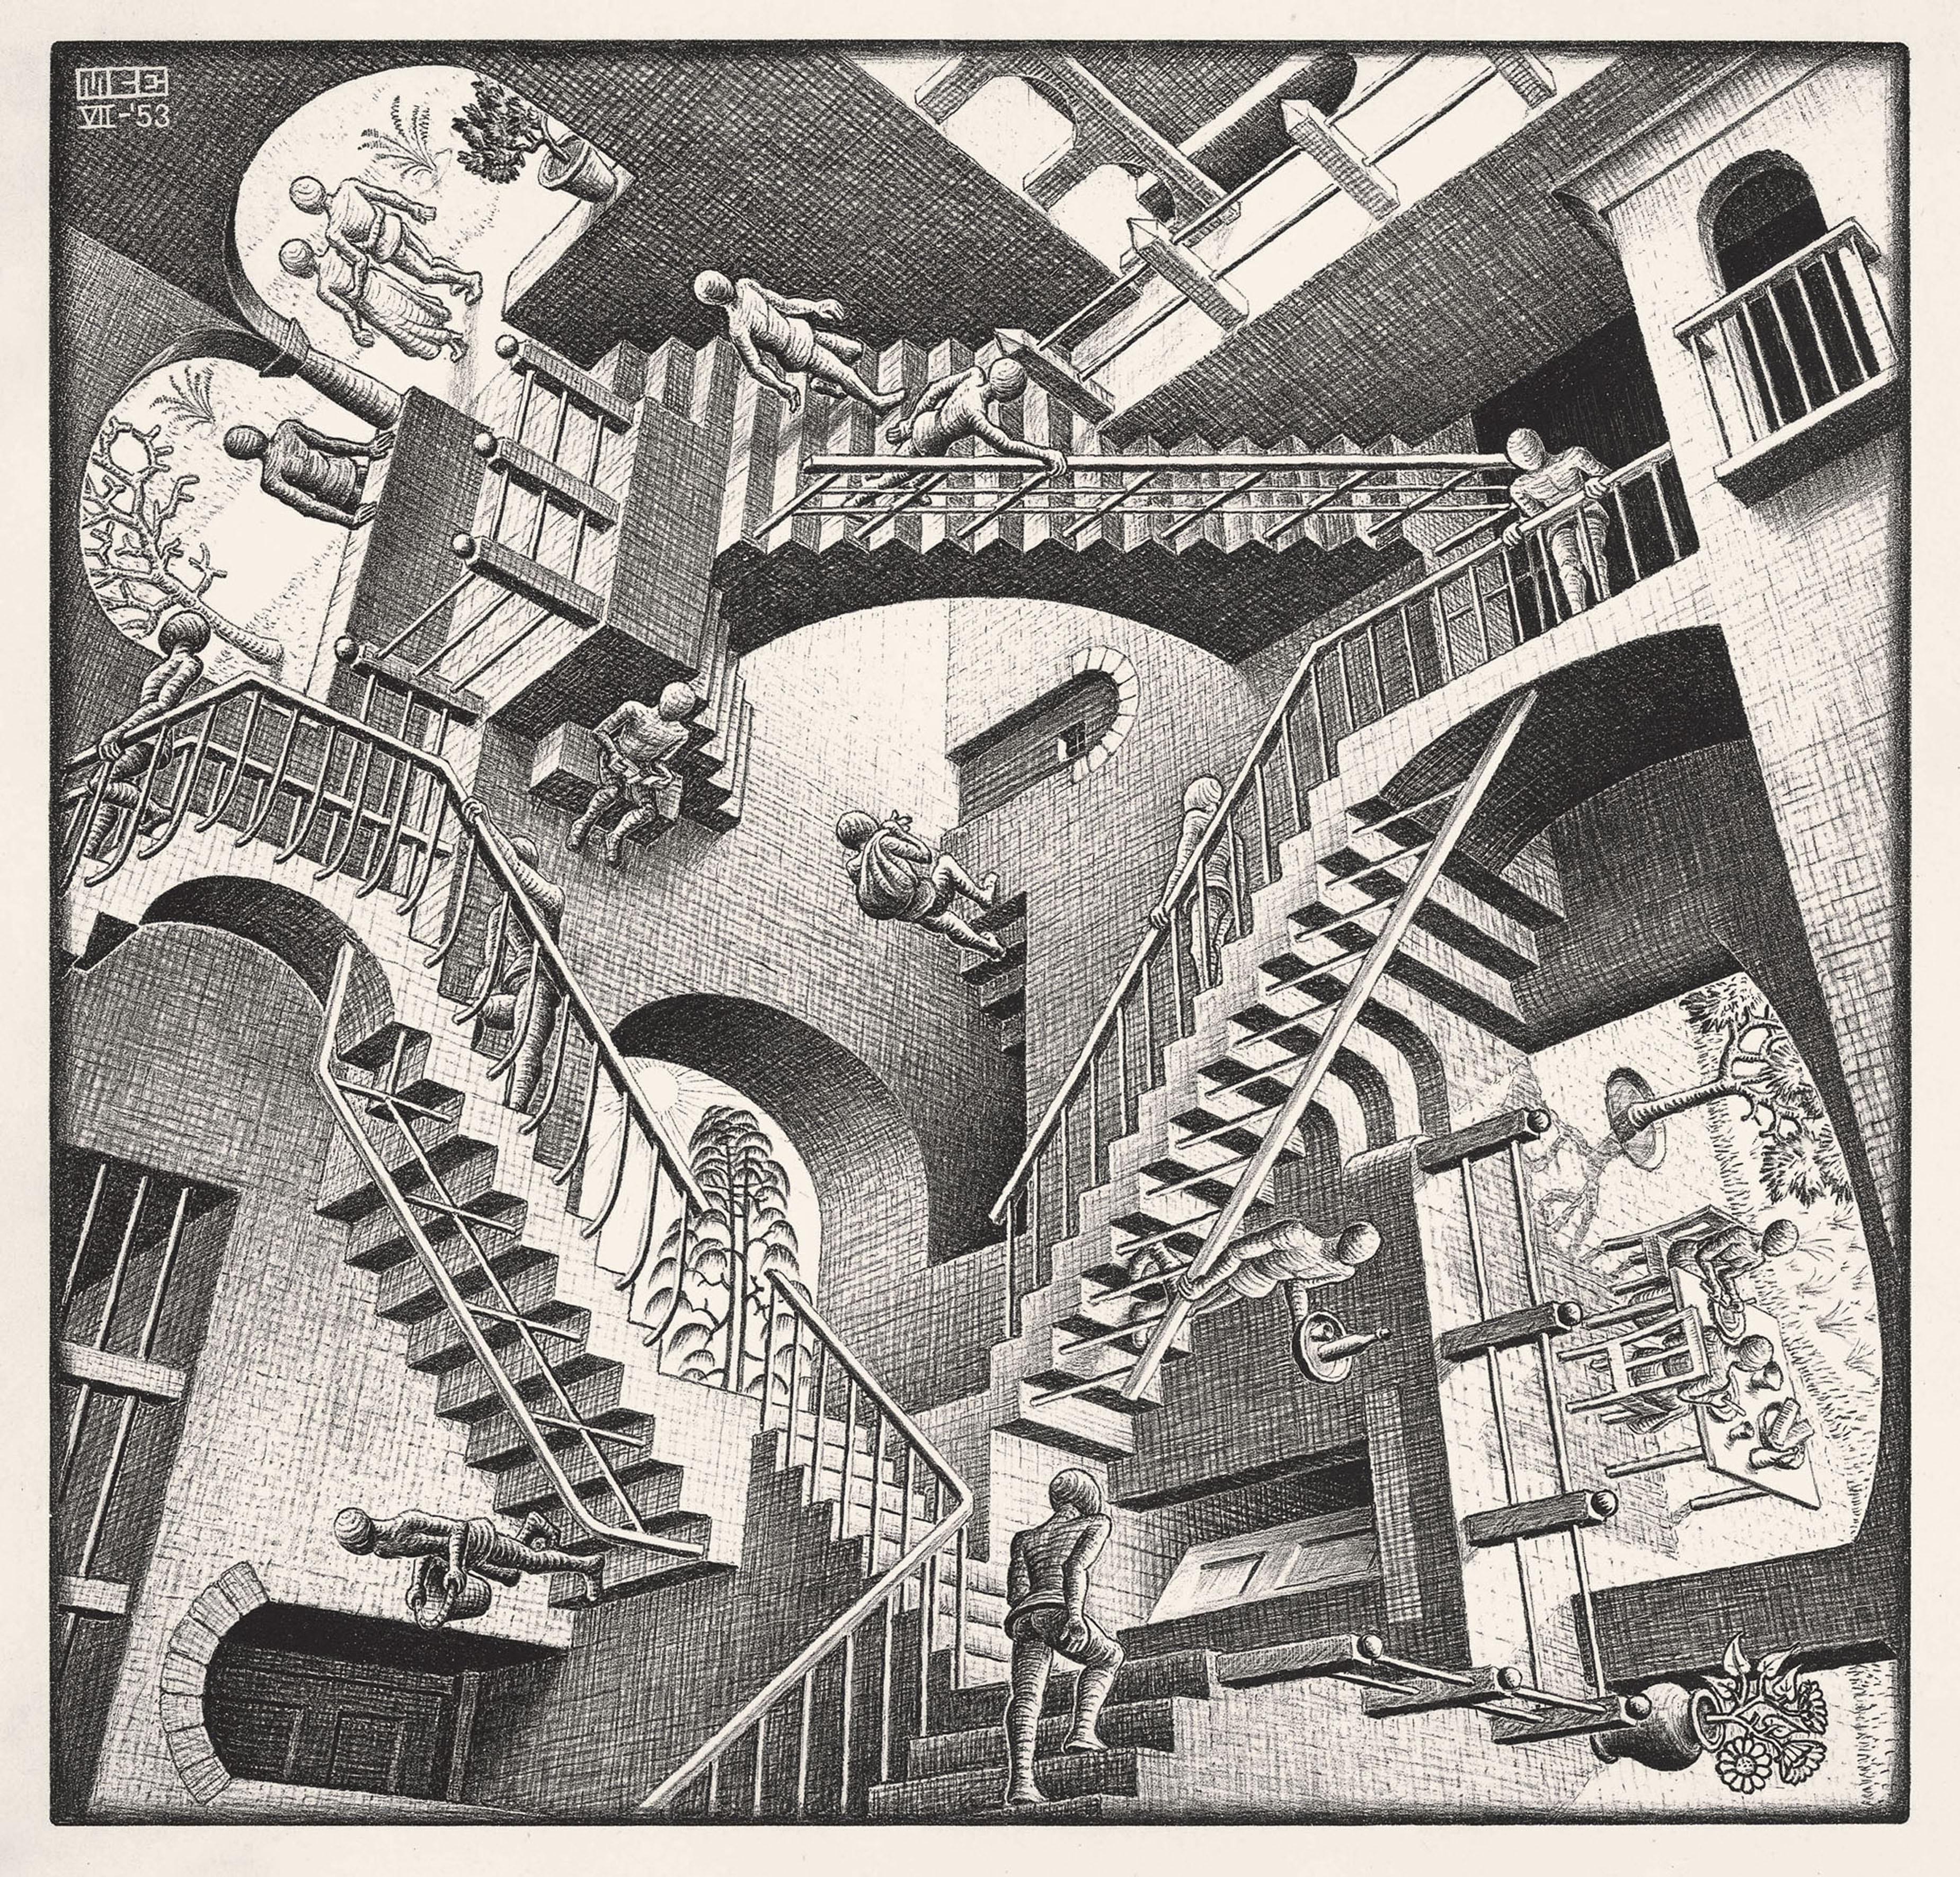 https://www.idealwork.it/wp-content/uploads/2019/12/05_Relativita%CC%80.jpg